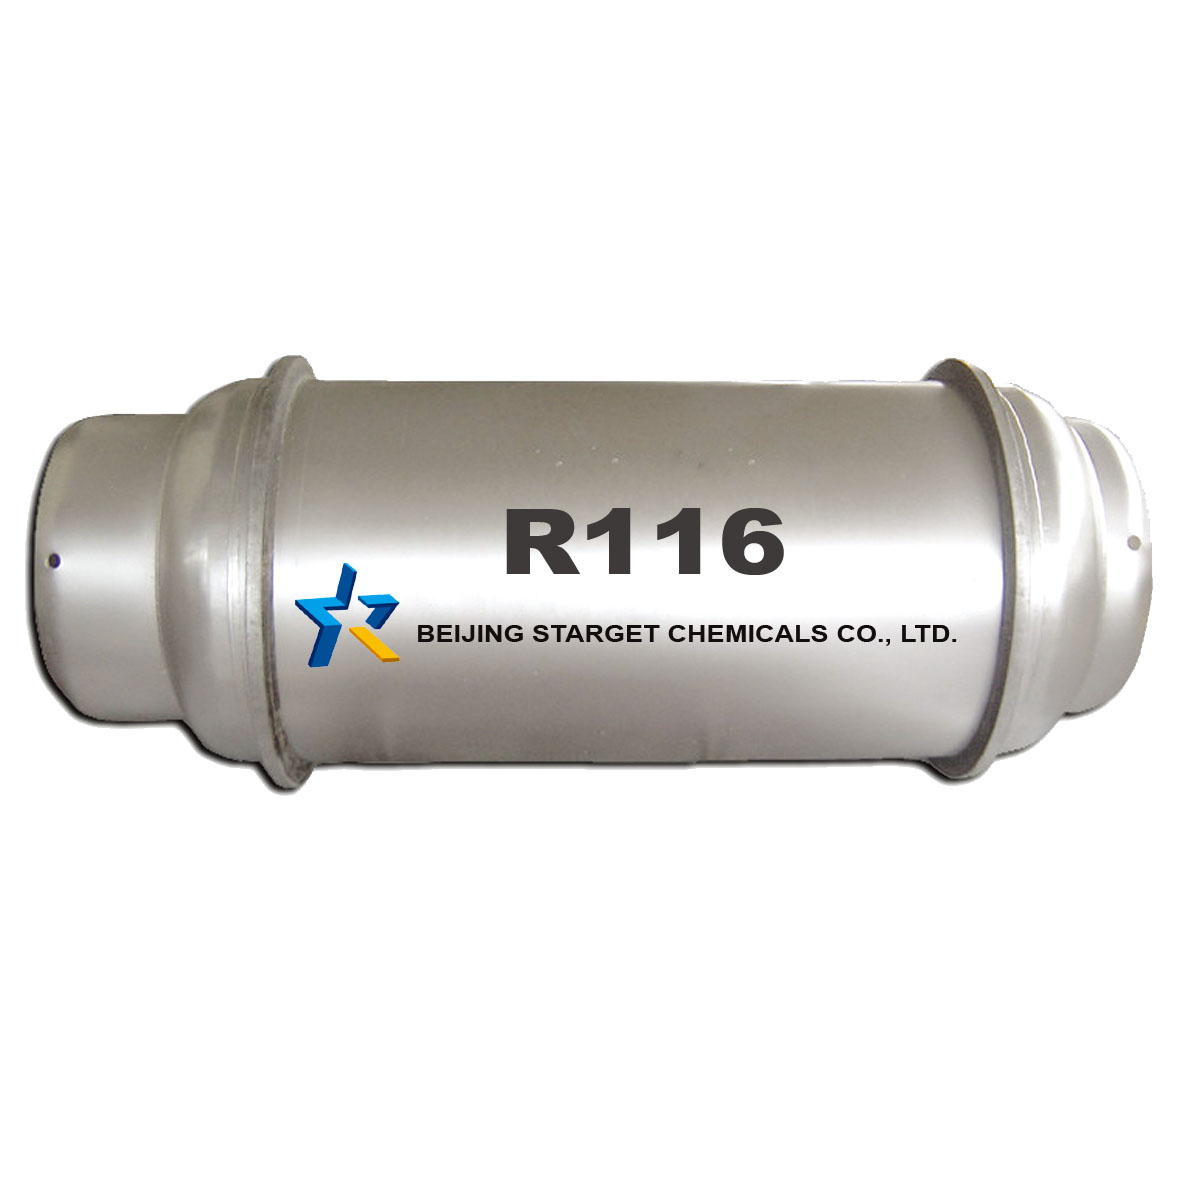 Refrigerant R116